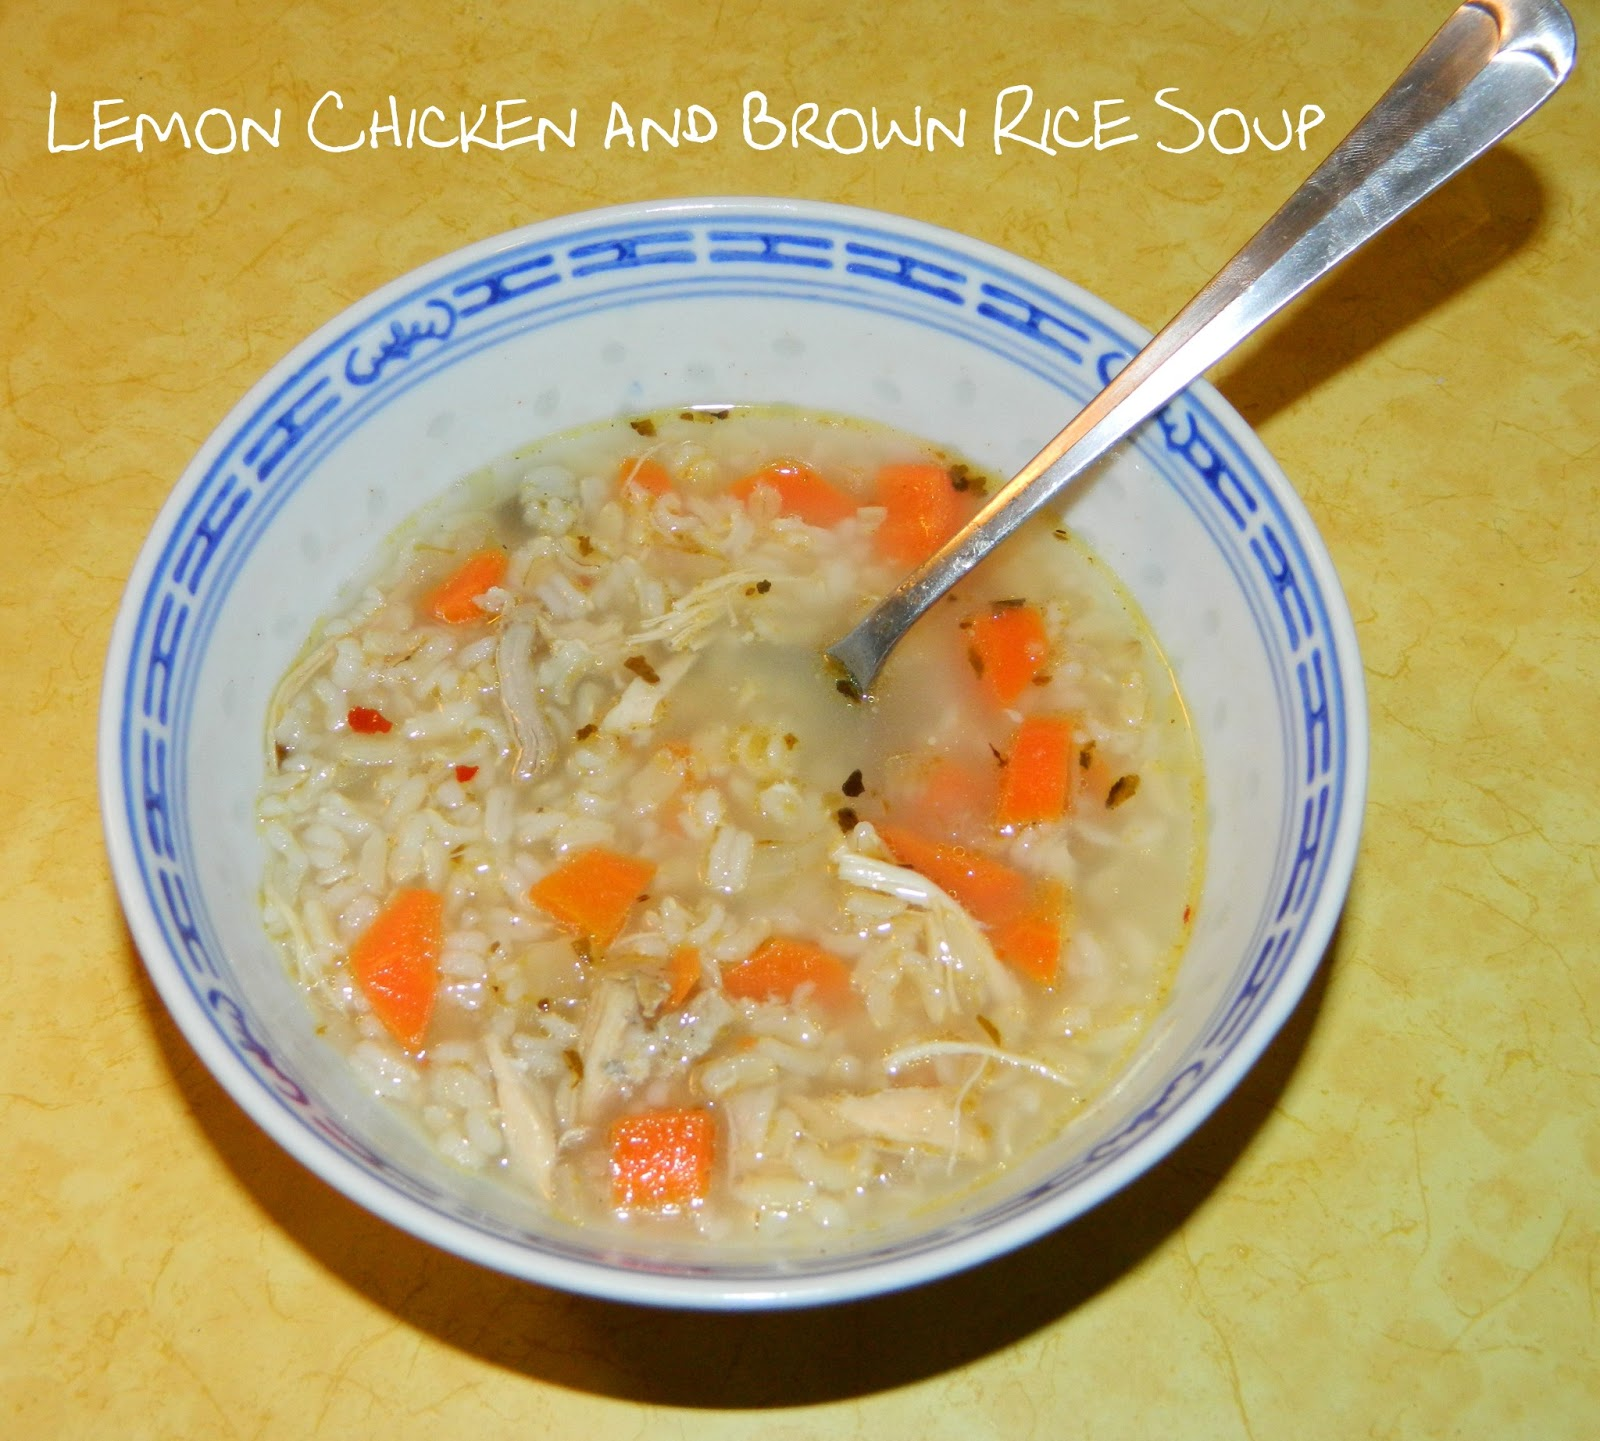 Life On Colgate: Crock Pot Lemon Chicken And Brown Rice Soup